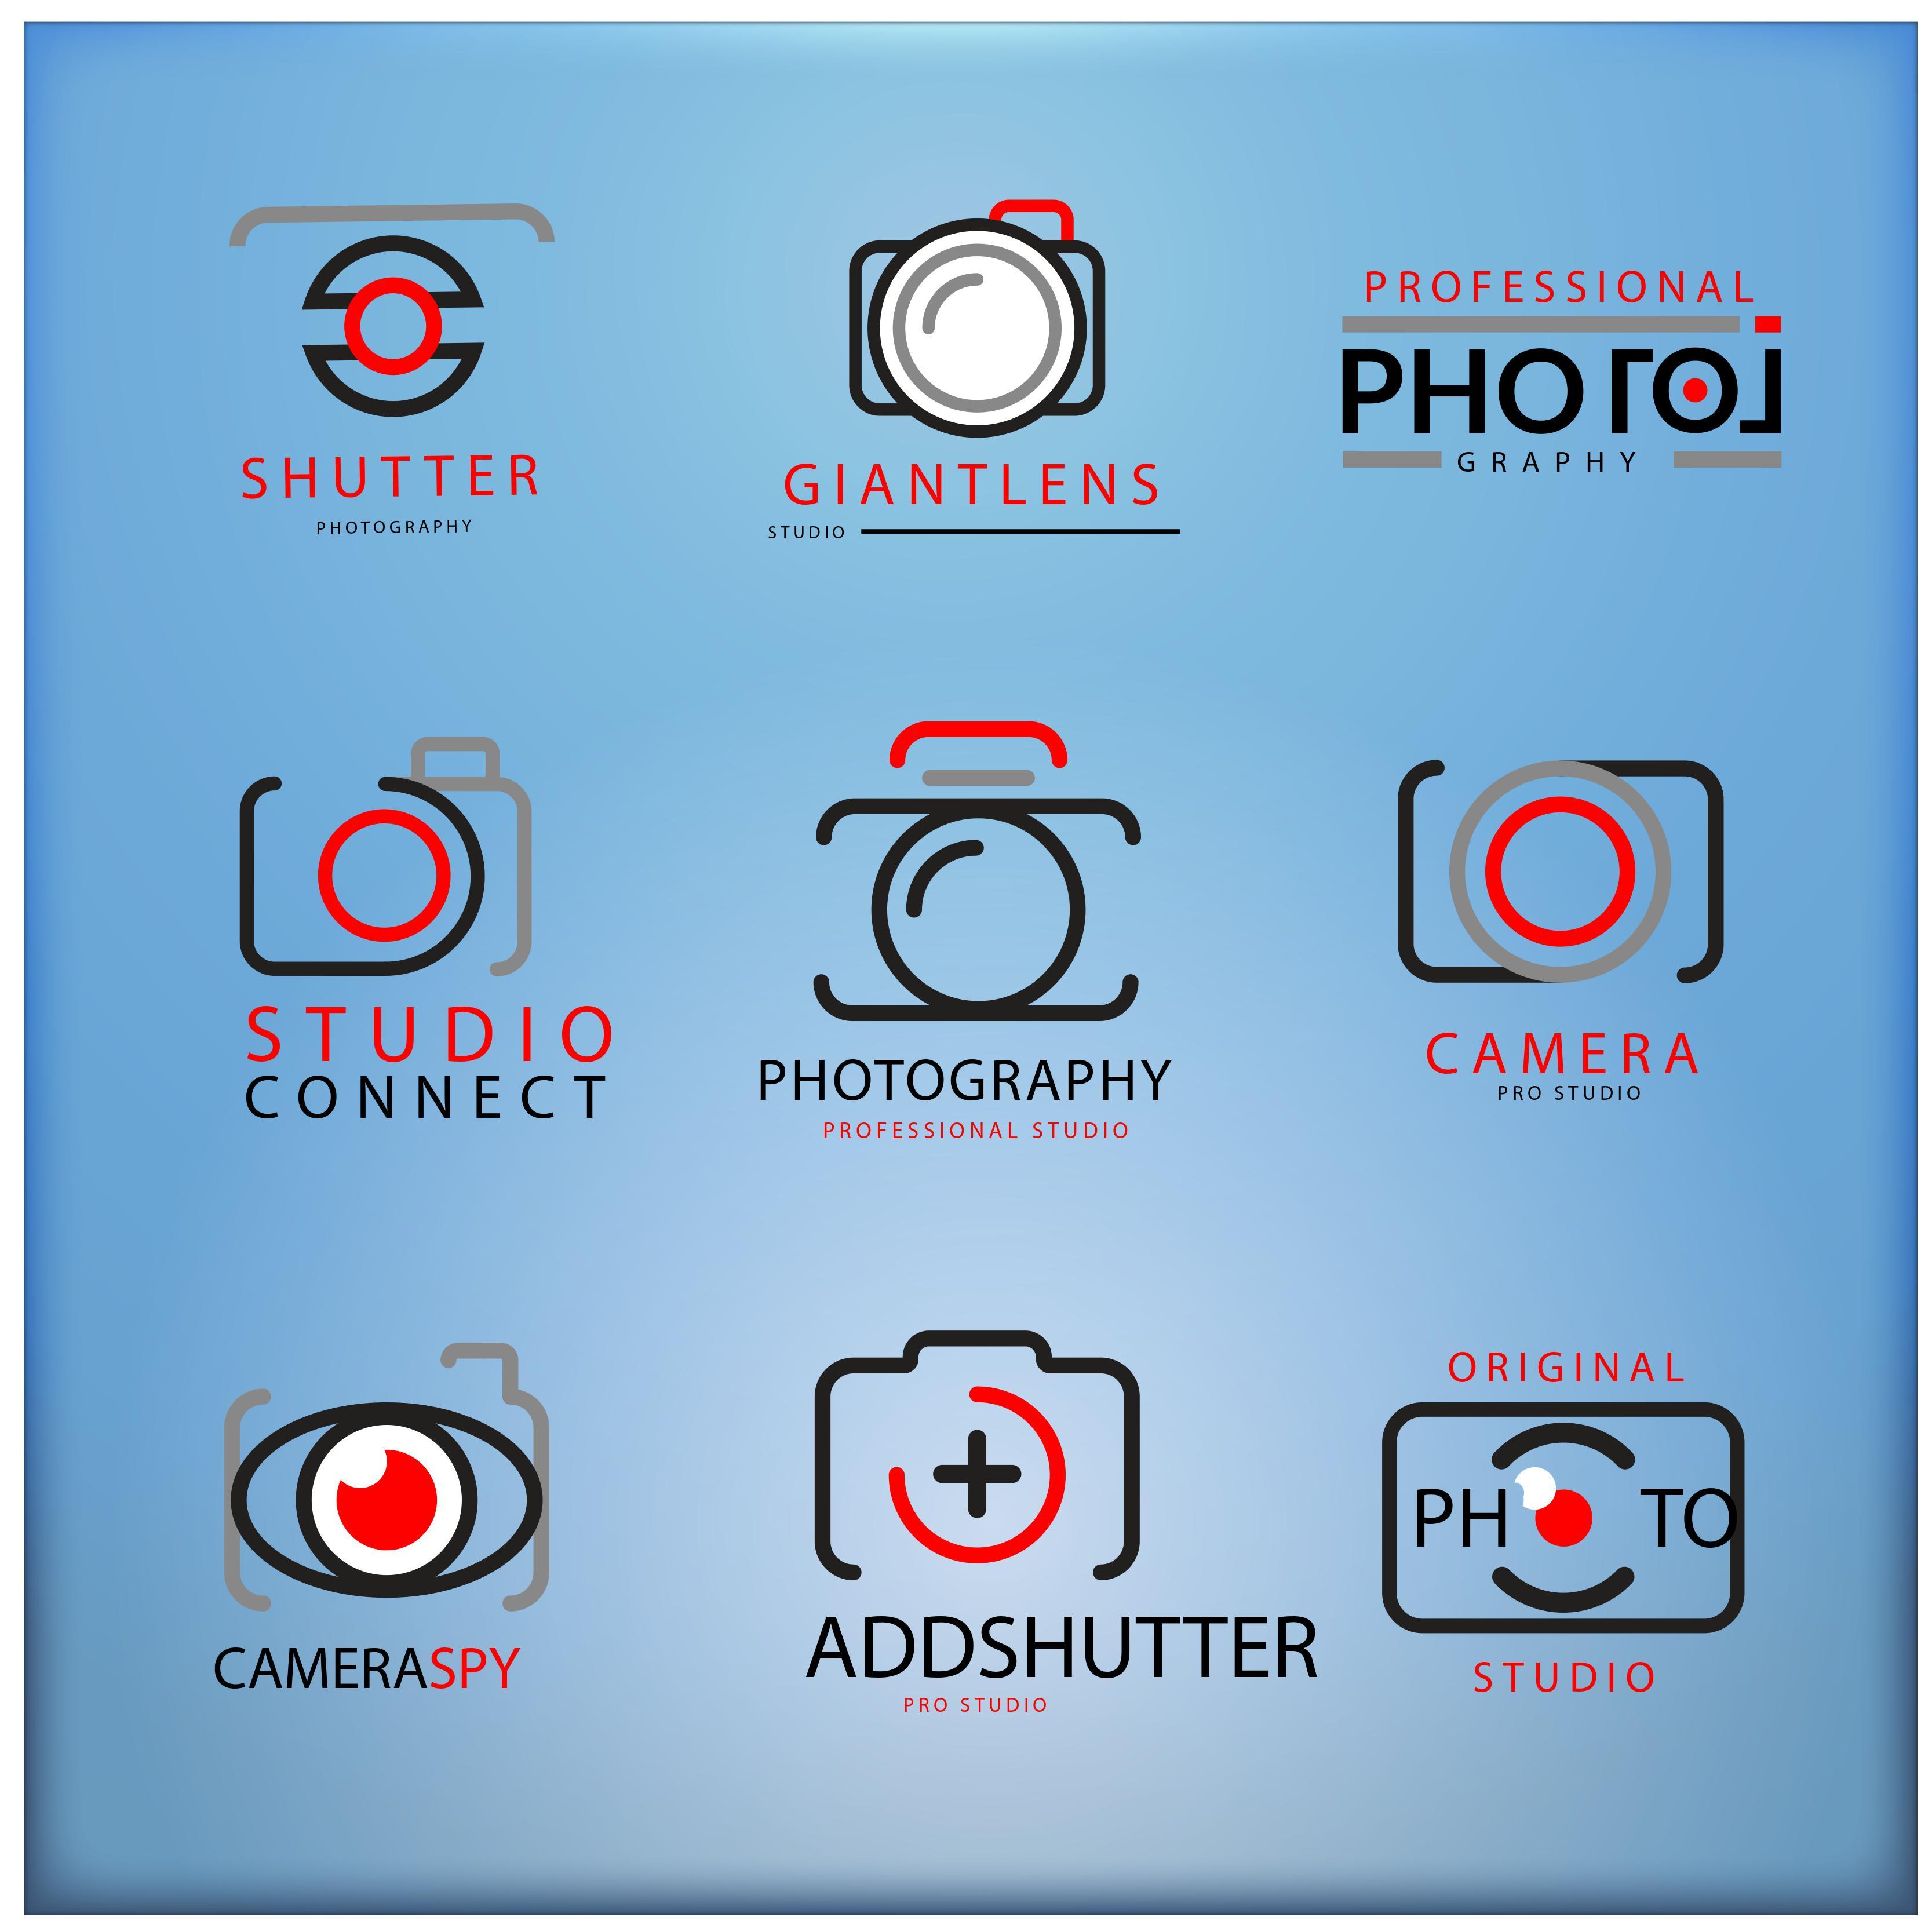 I will design photography logos